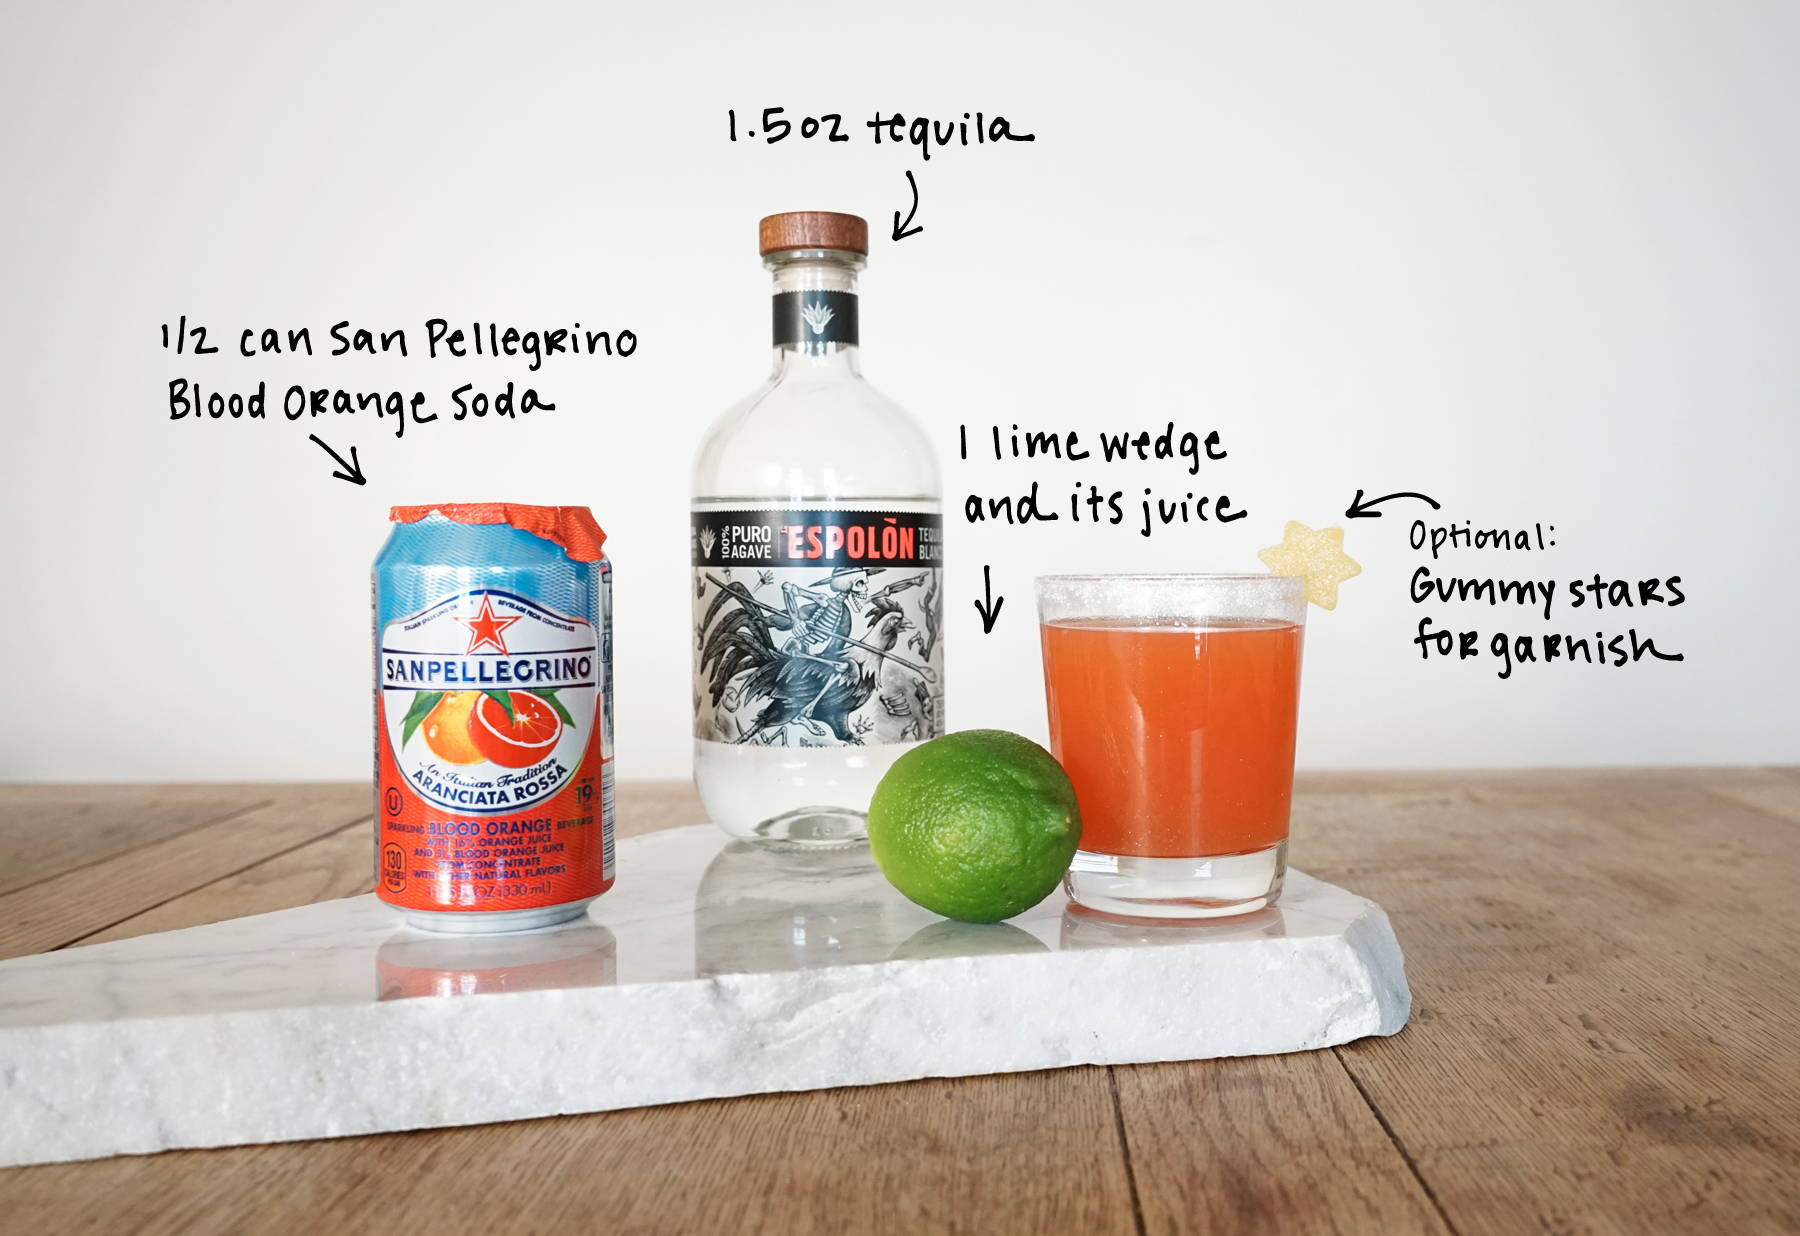 Unicorn Snot Spritz recipe with espolon tequila, san pellegrino blood orange soda, lime juice and dylan's candy bar gummies.